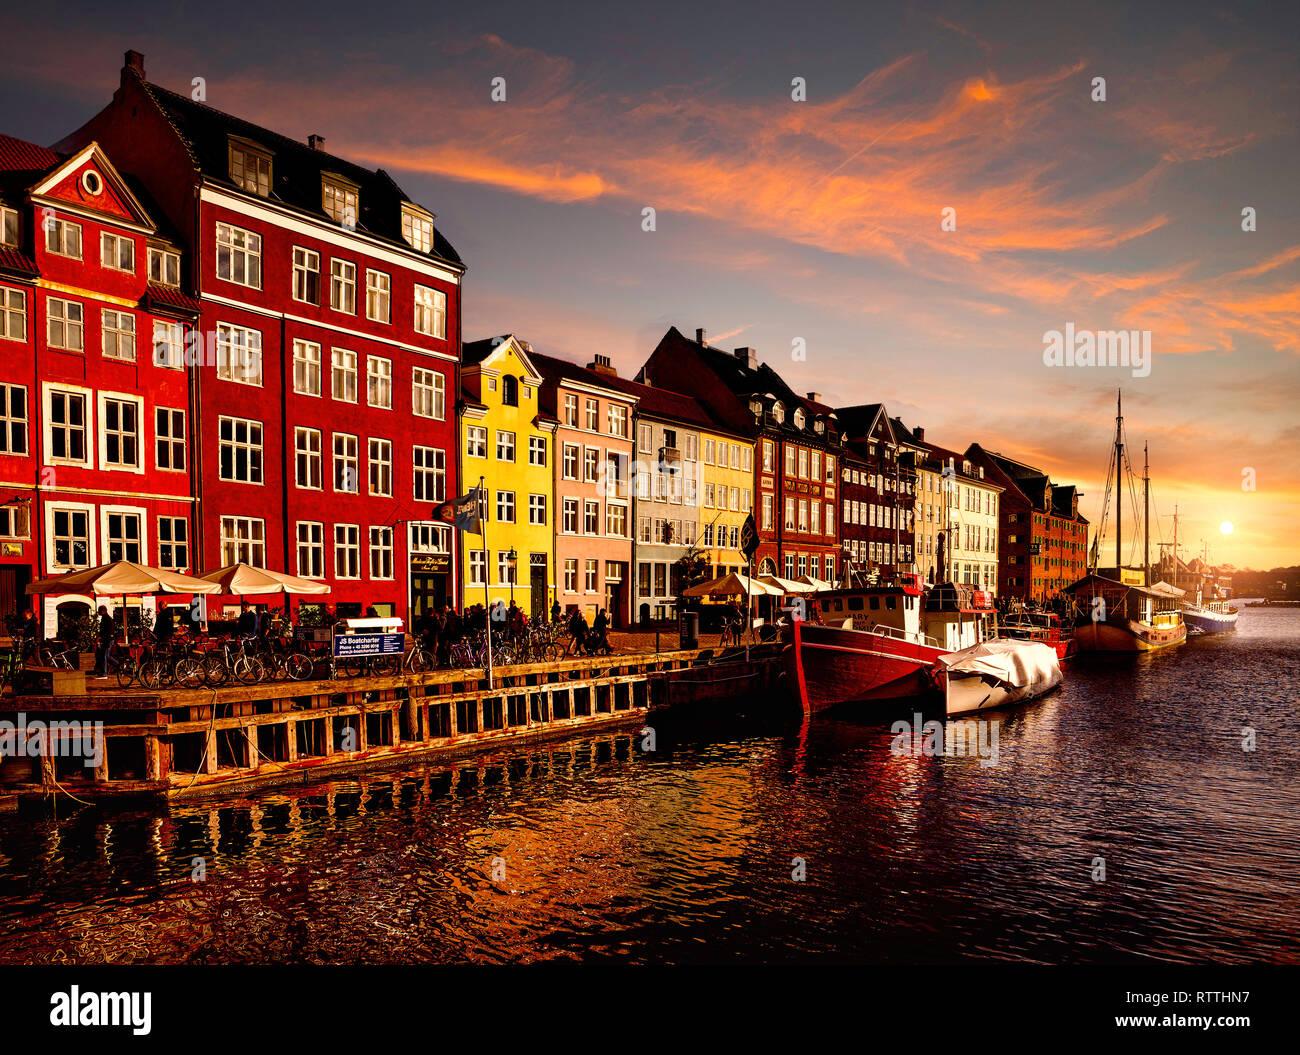 Al atardecer, Nyhavn en Copenhague, Dinamarca. Foto de stock